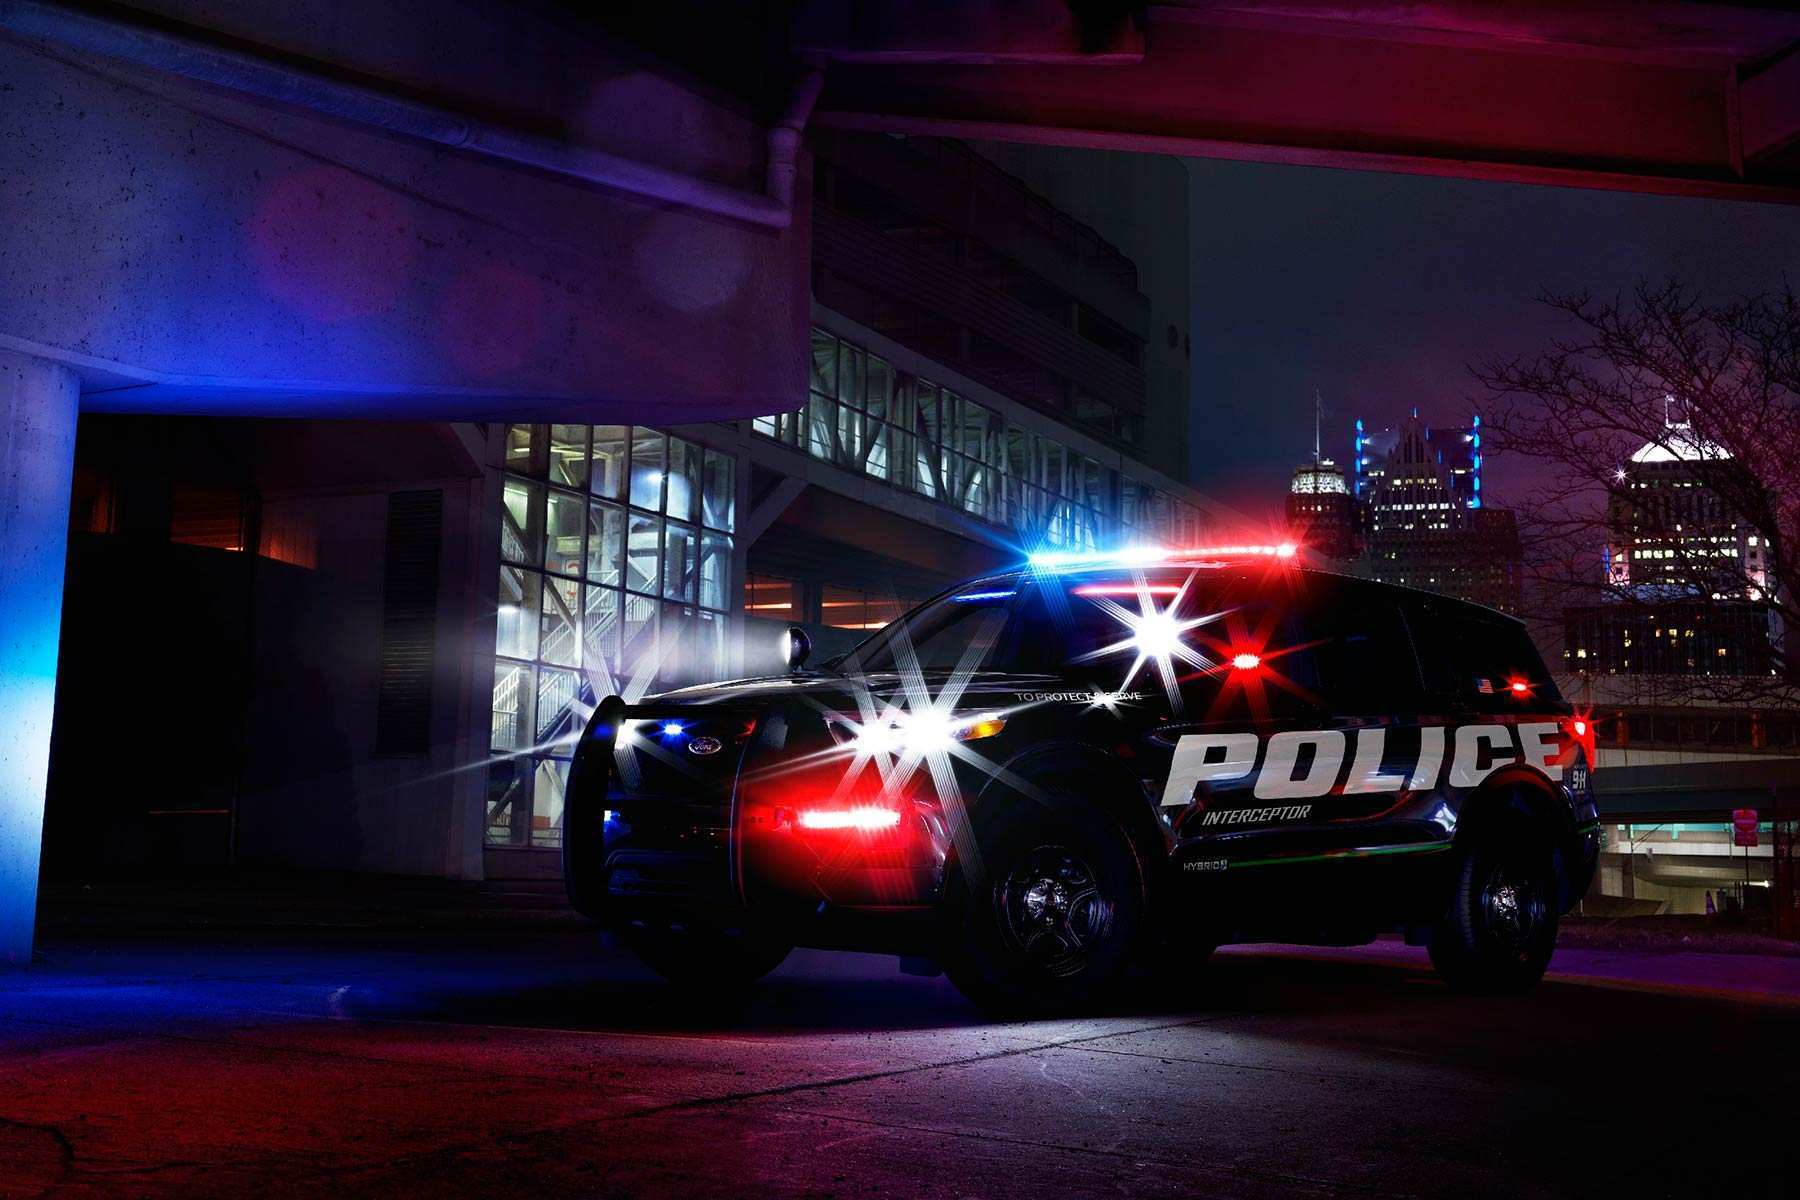 76 Gallery of 2019 Ford Interceptor Suv Speed Test by 2019 Ford Interceptor Suv